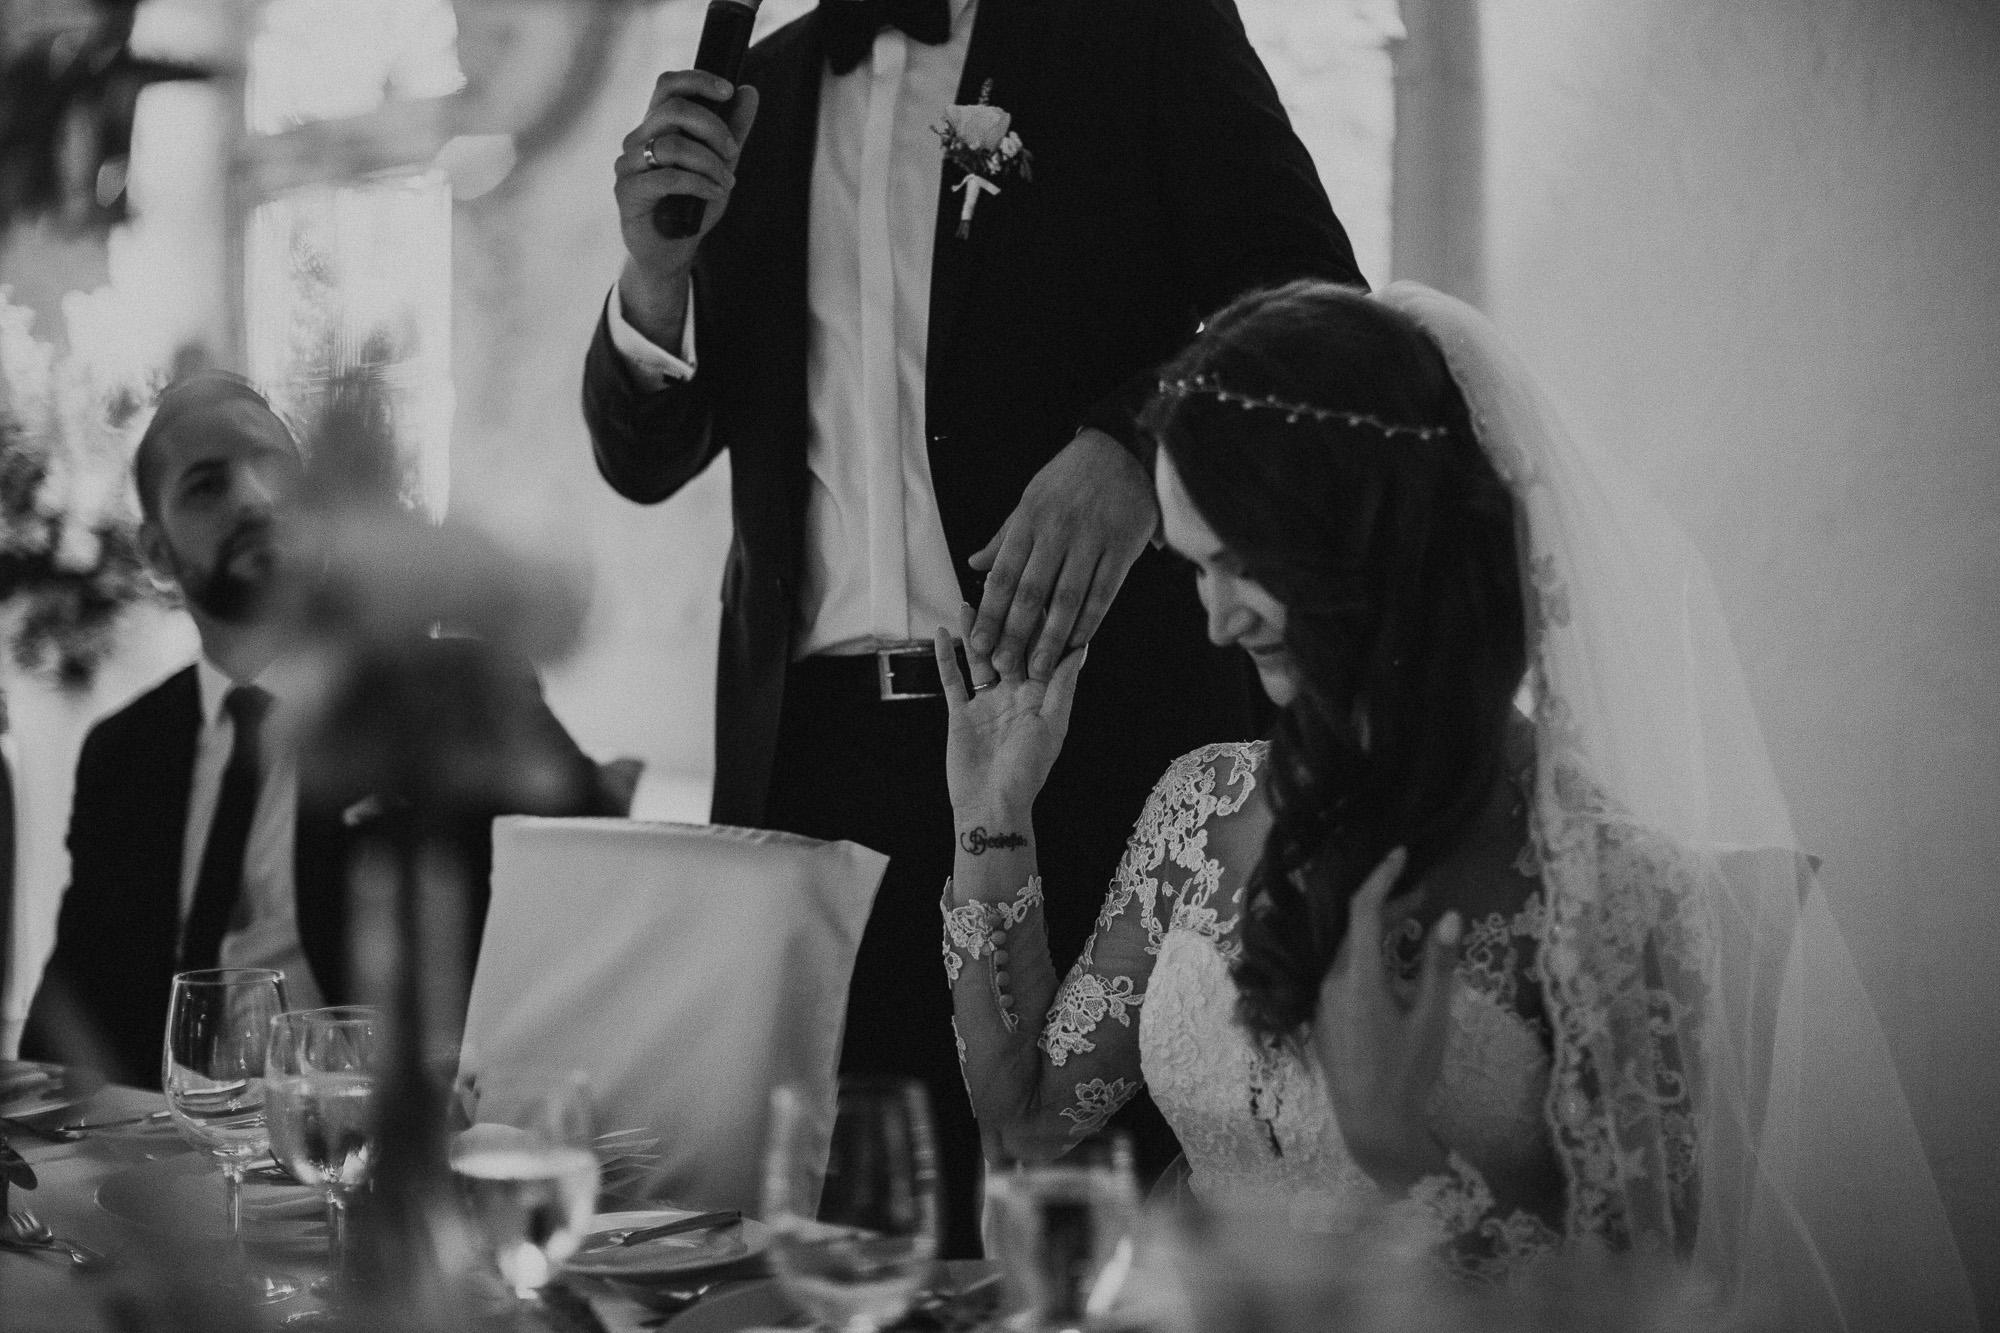 DanielaMarquardtPhotography_Hochzeitsfotograf_Düsseldorf_Köln_Mallorca_Bayern_Austria_Harz_Wedding_AileenundLennart_Weddingphotographer_Ibiza_Tuskany_Italien_Toskana_Portugal_Lissabon226